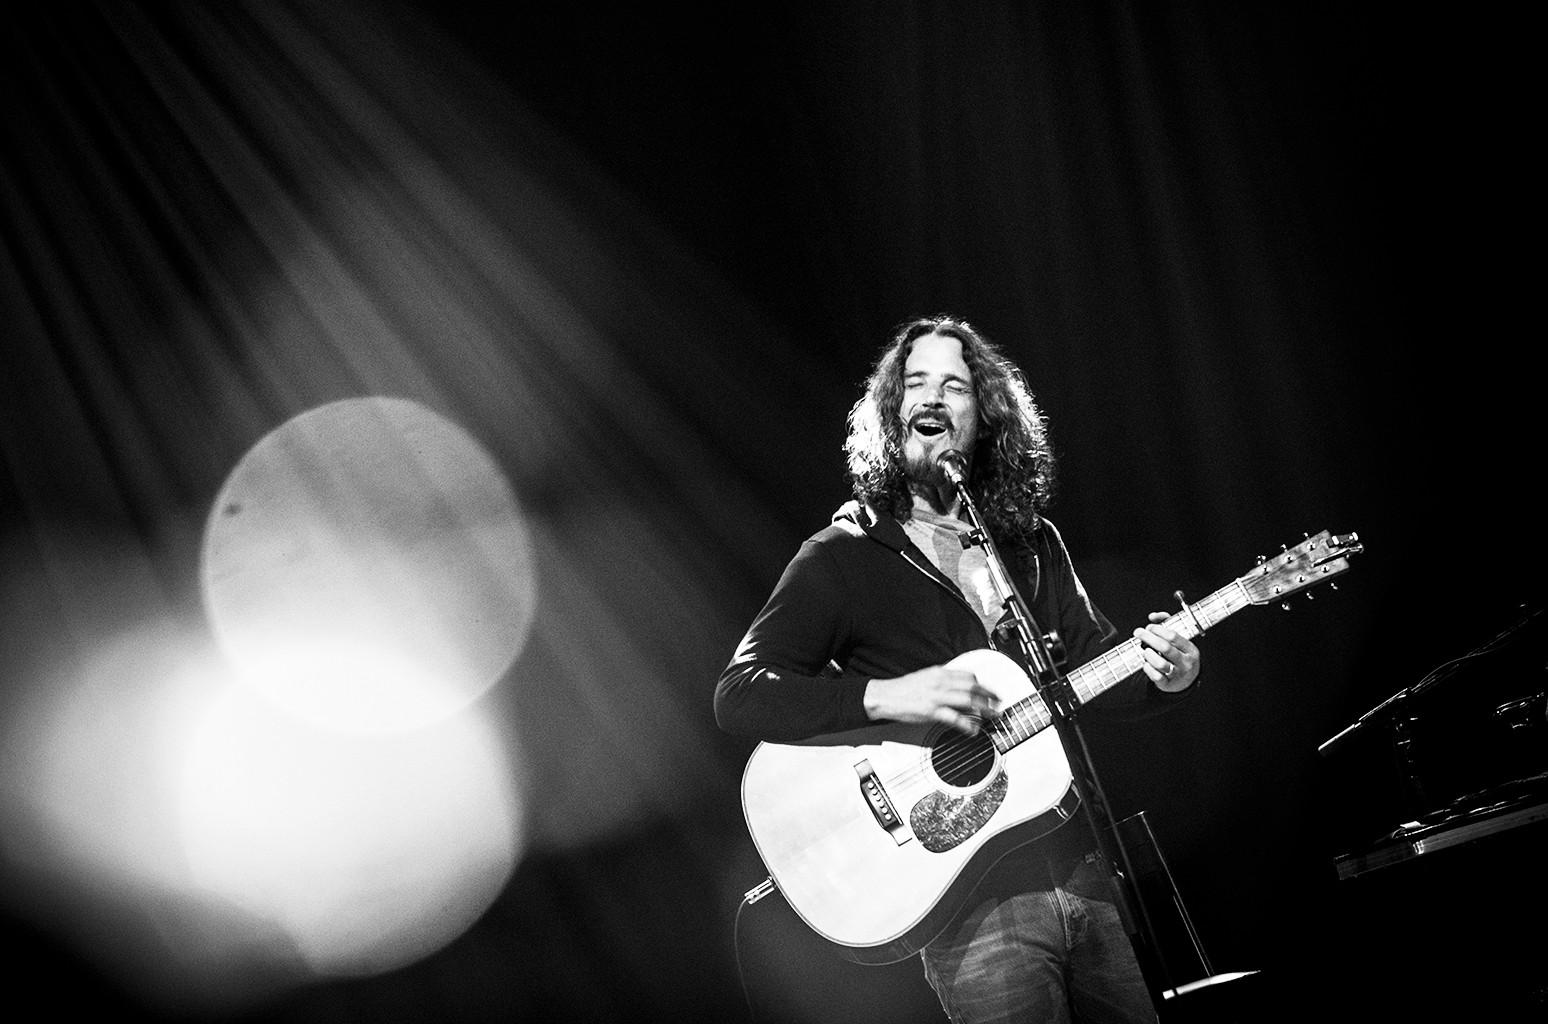 Chris Cornell performs at Teatro Bradesco on Dec. 8, 2016 in Rio de Janeiro, Brazil.